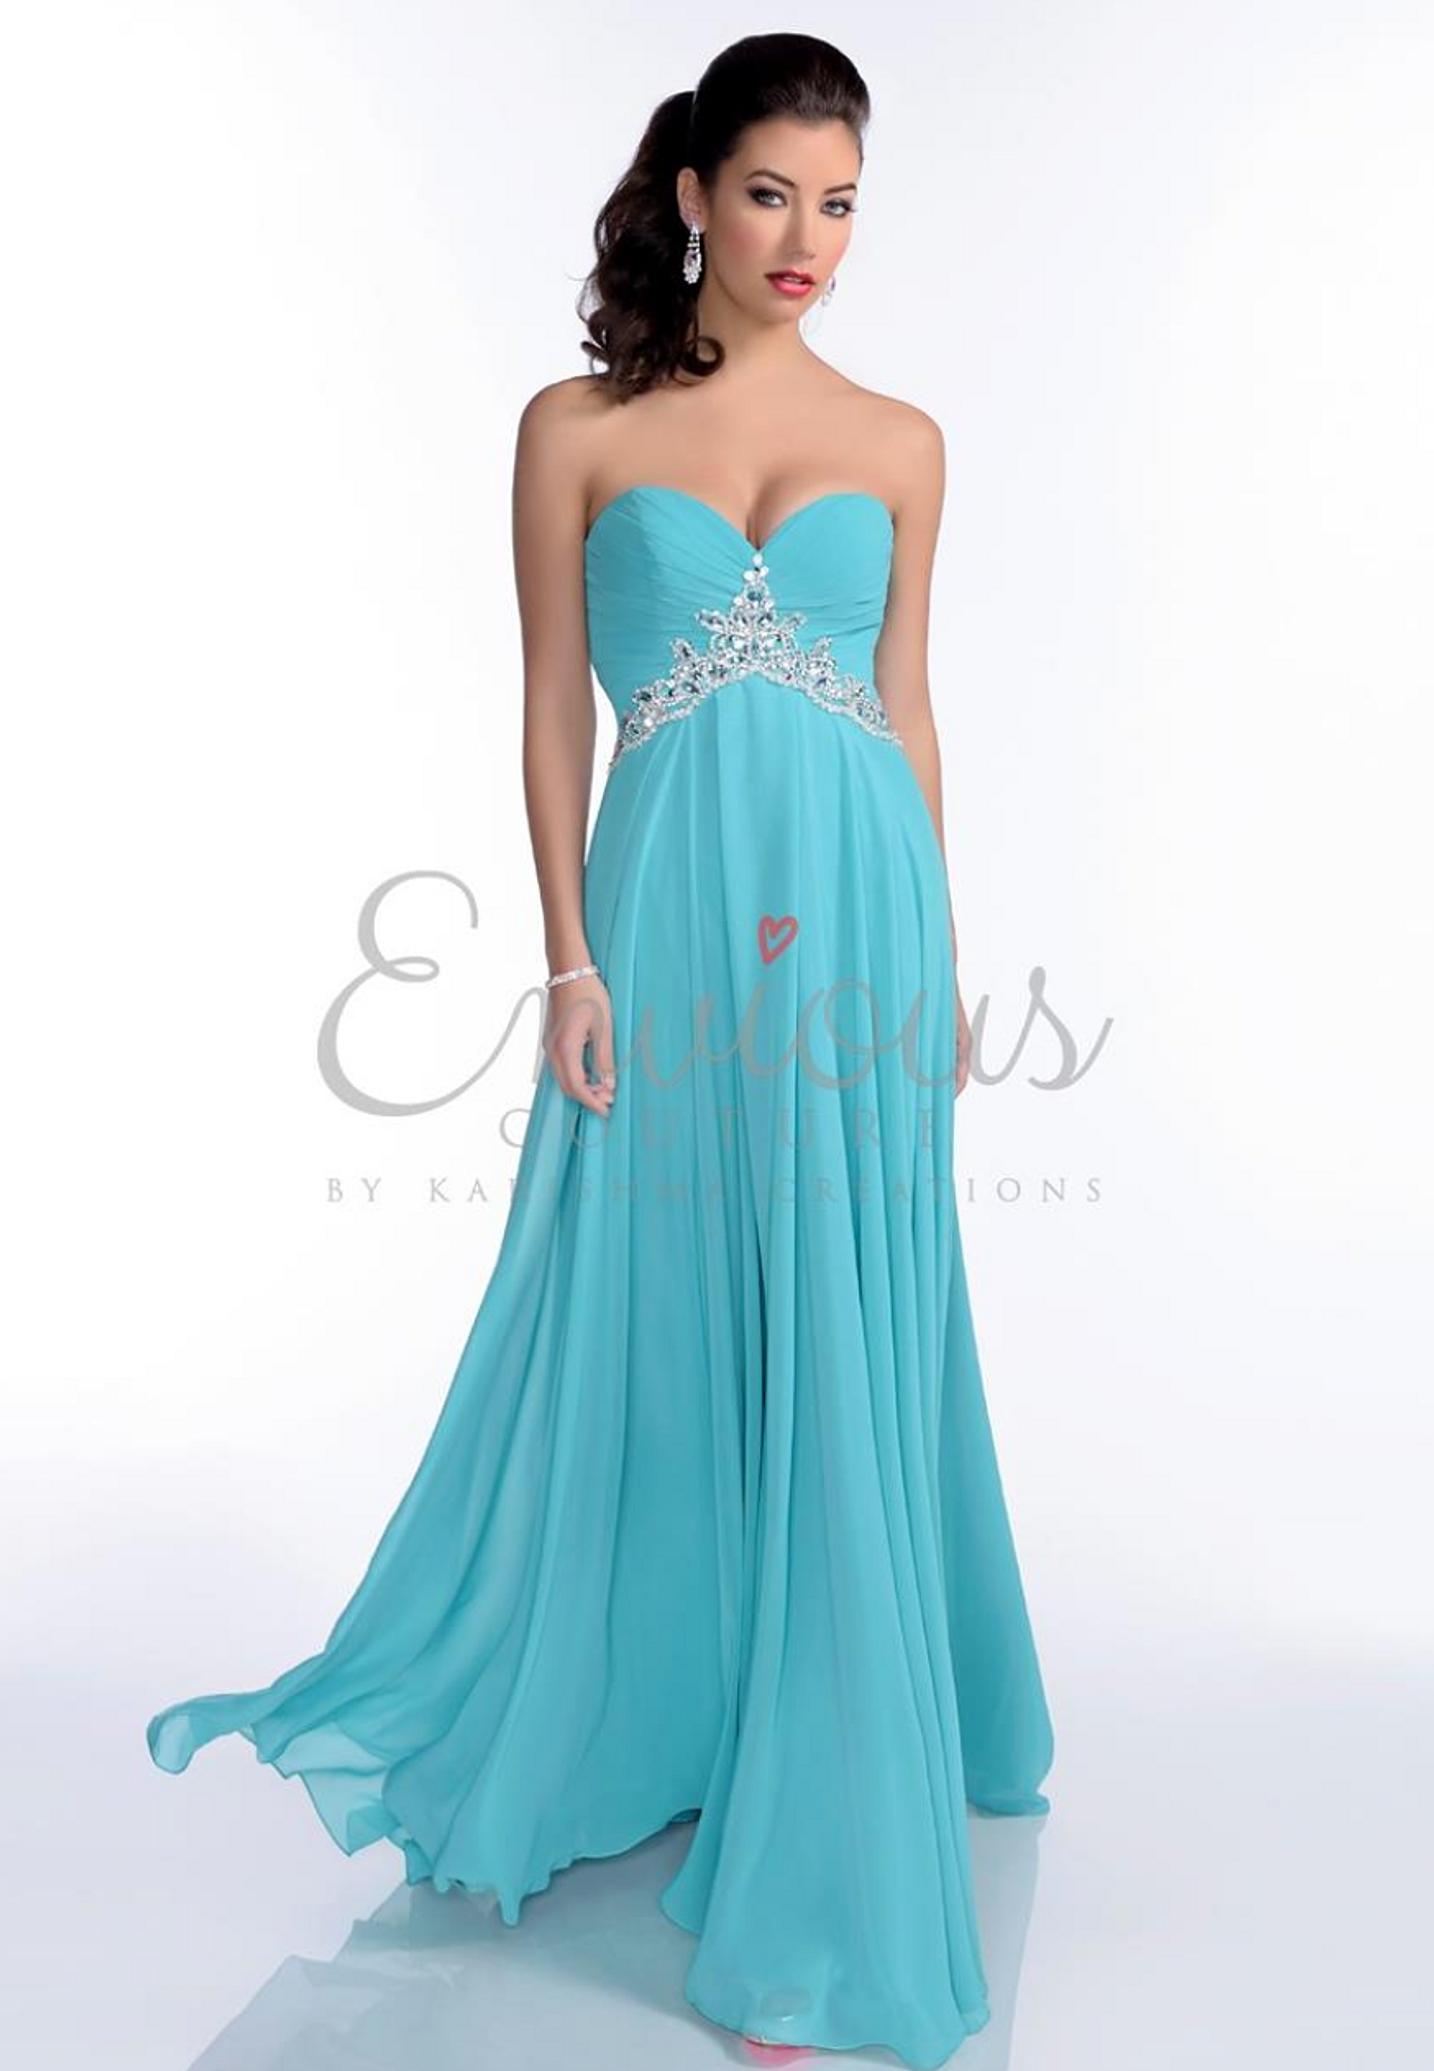 miLA Bridal | Prom Dresses | Richmond, VA